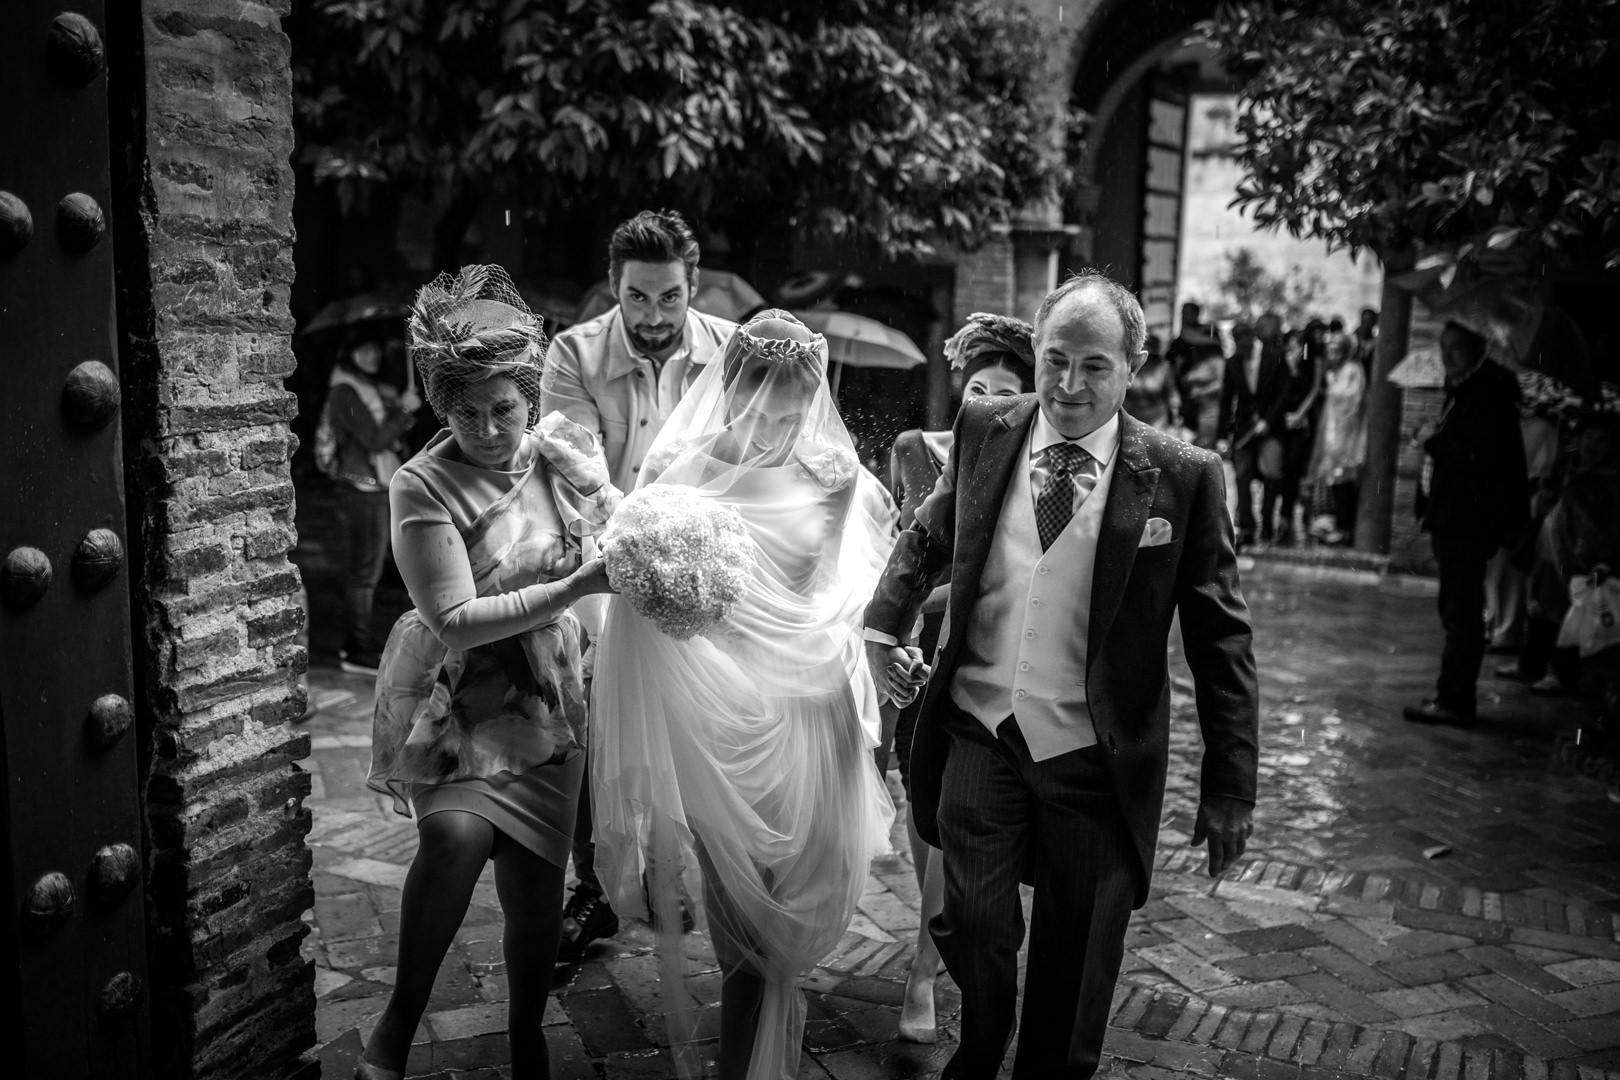 Boda-sevilla-Wedding-engagement-Rafael-Torres-fotografo-bodas-sevilla-madrid-barcelona-wedding-photographer--30.jpg